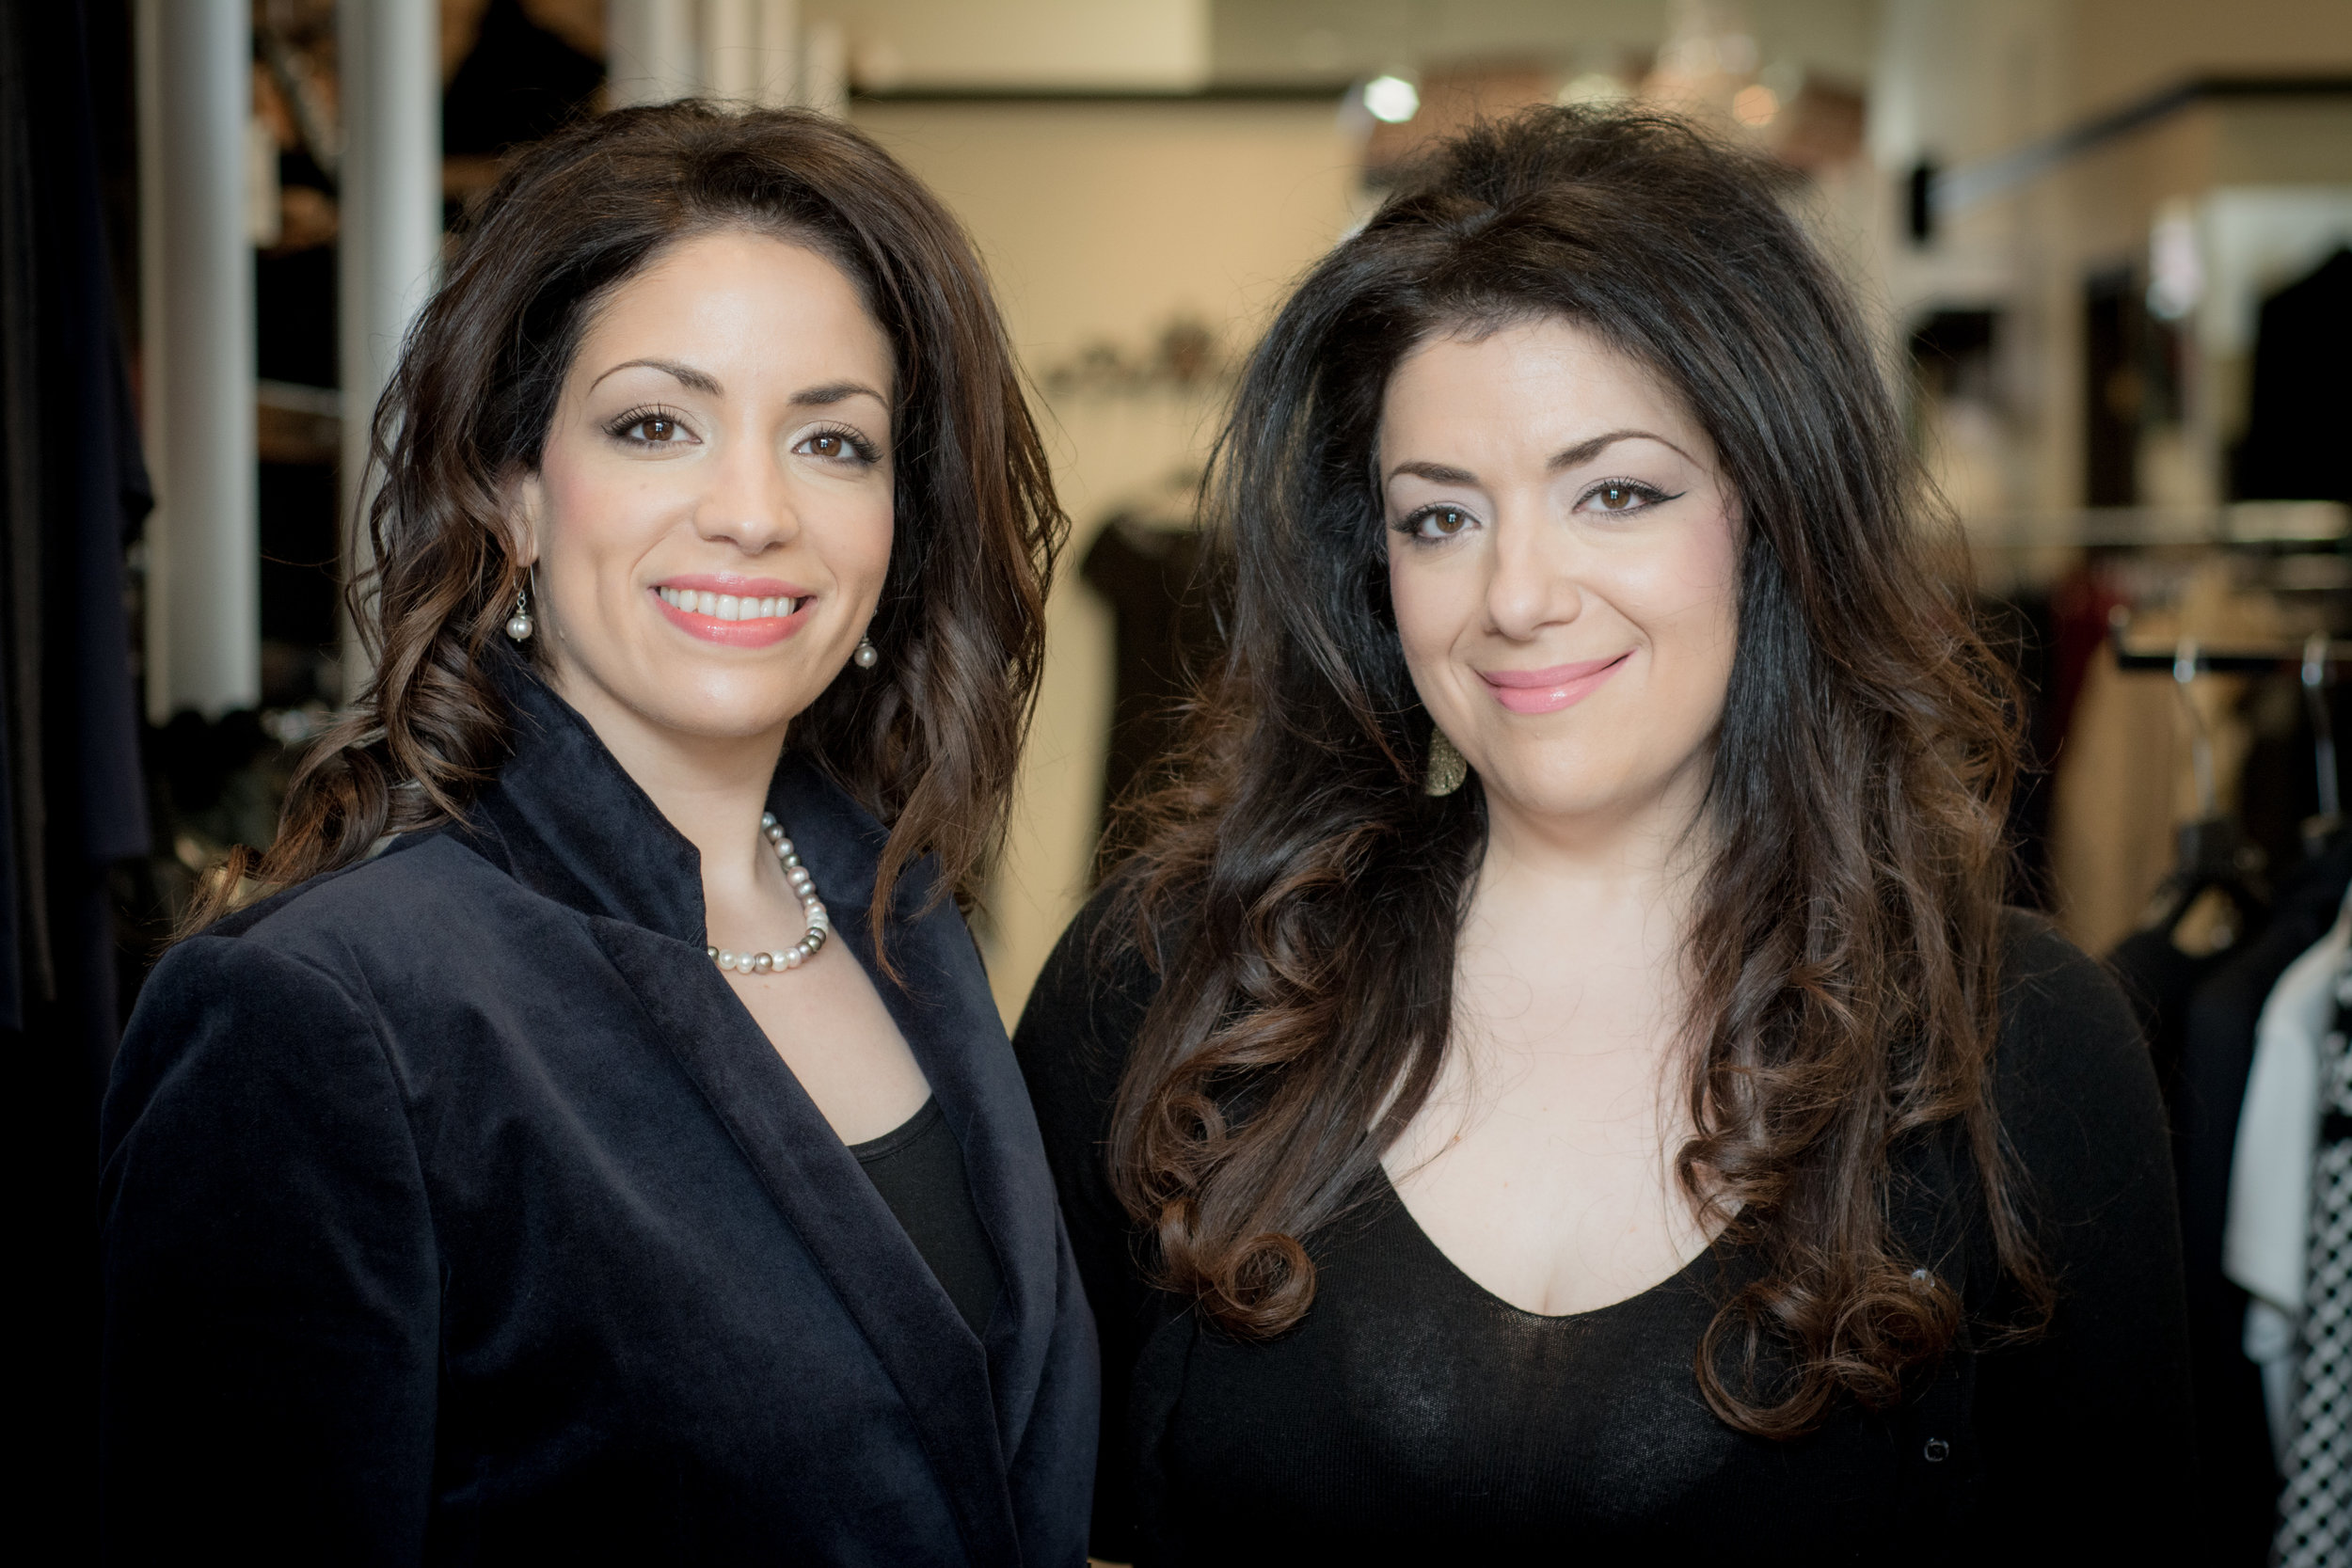 Joanne and Maria Angelis